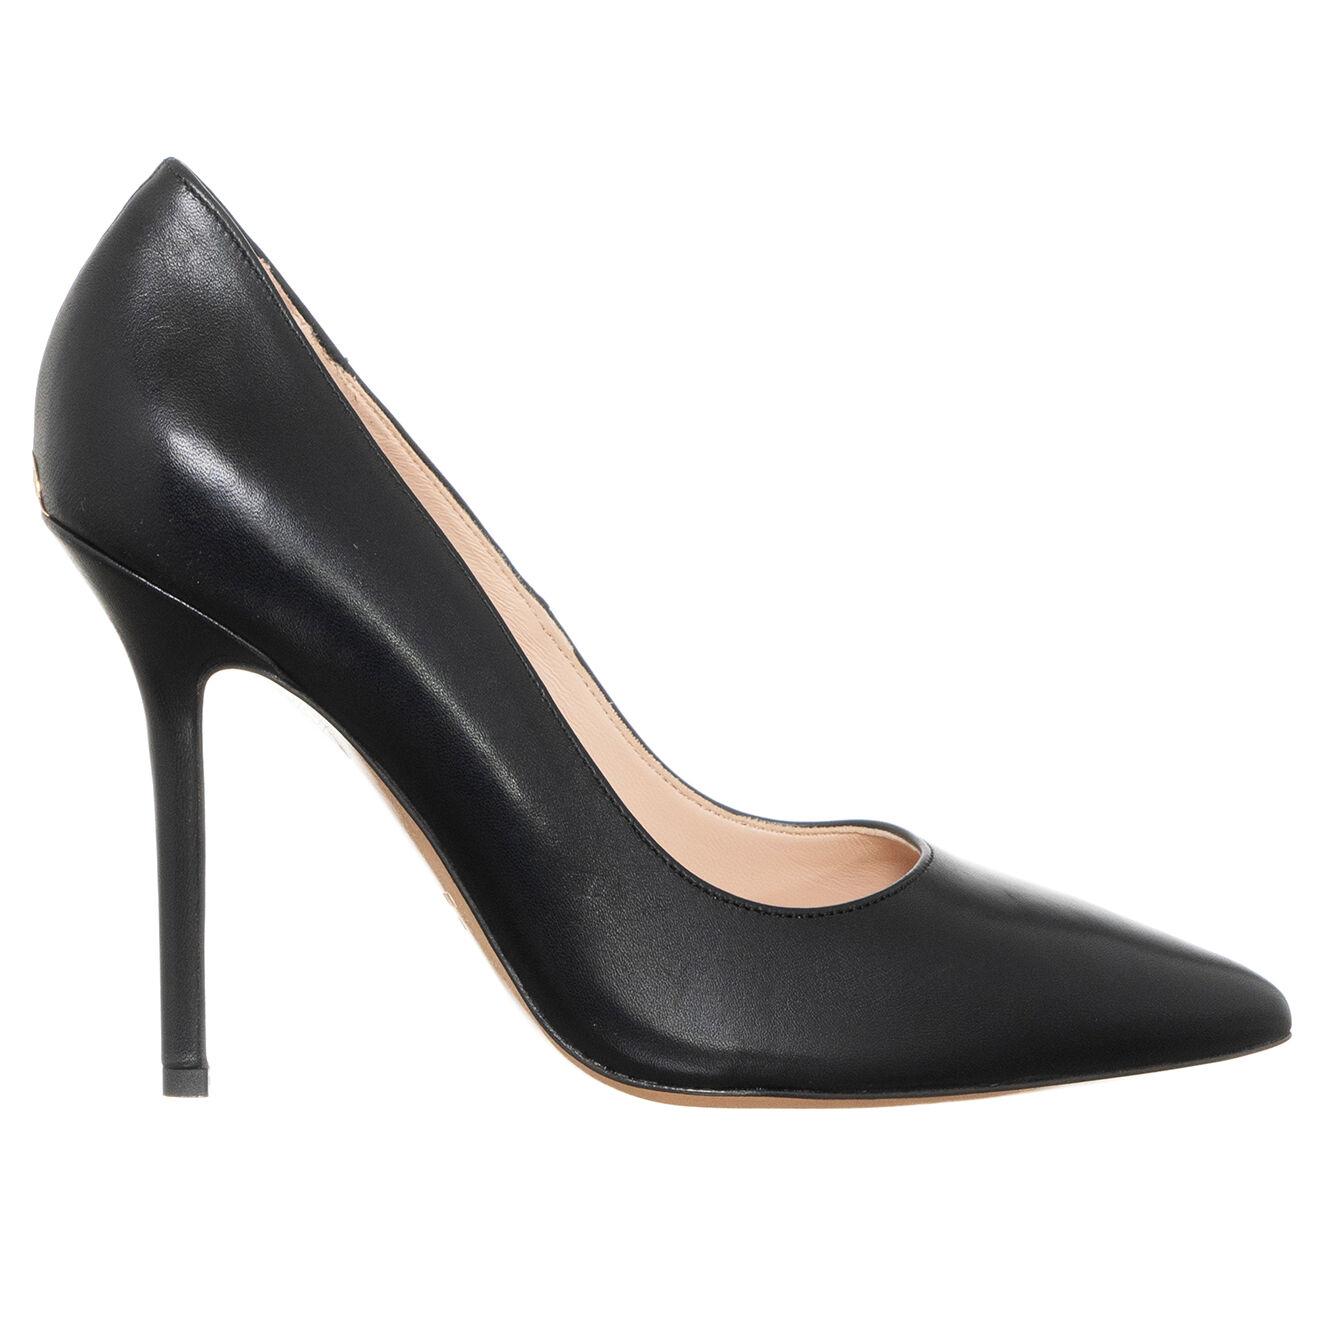 Escarpins Cuir Marilyn noirs - Talon 10 cm - Liu-Jo - Modalova